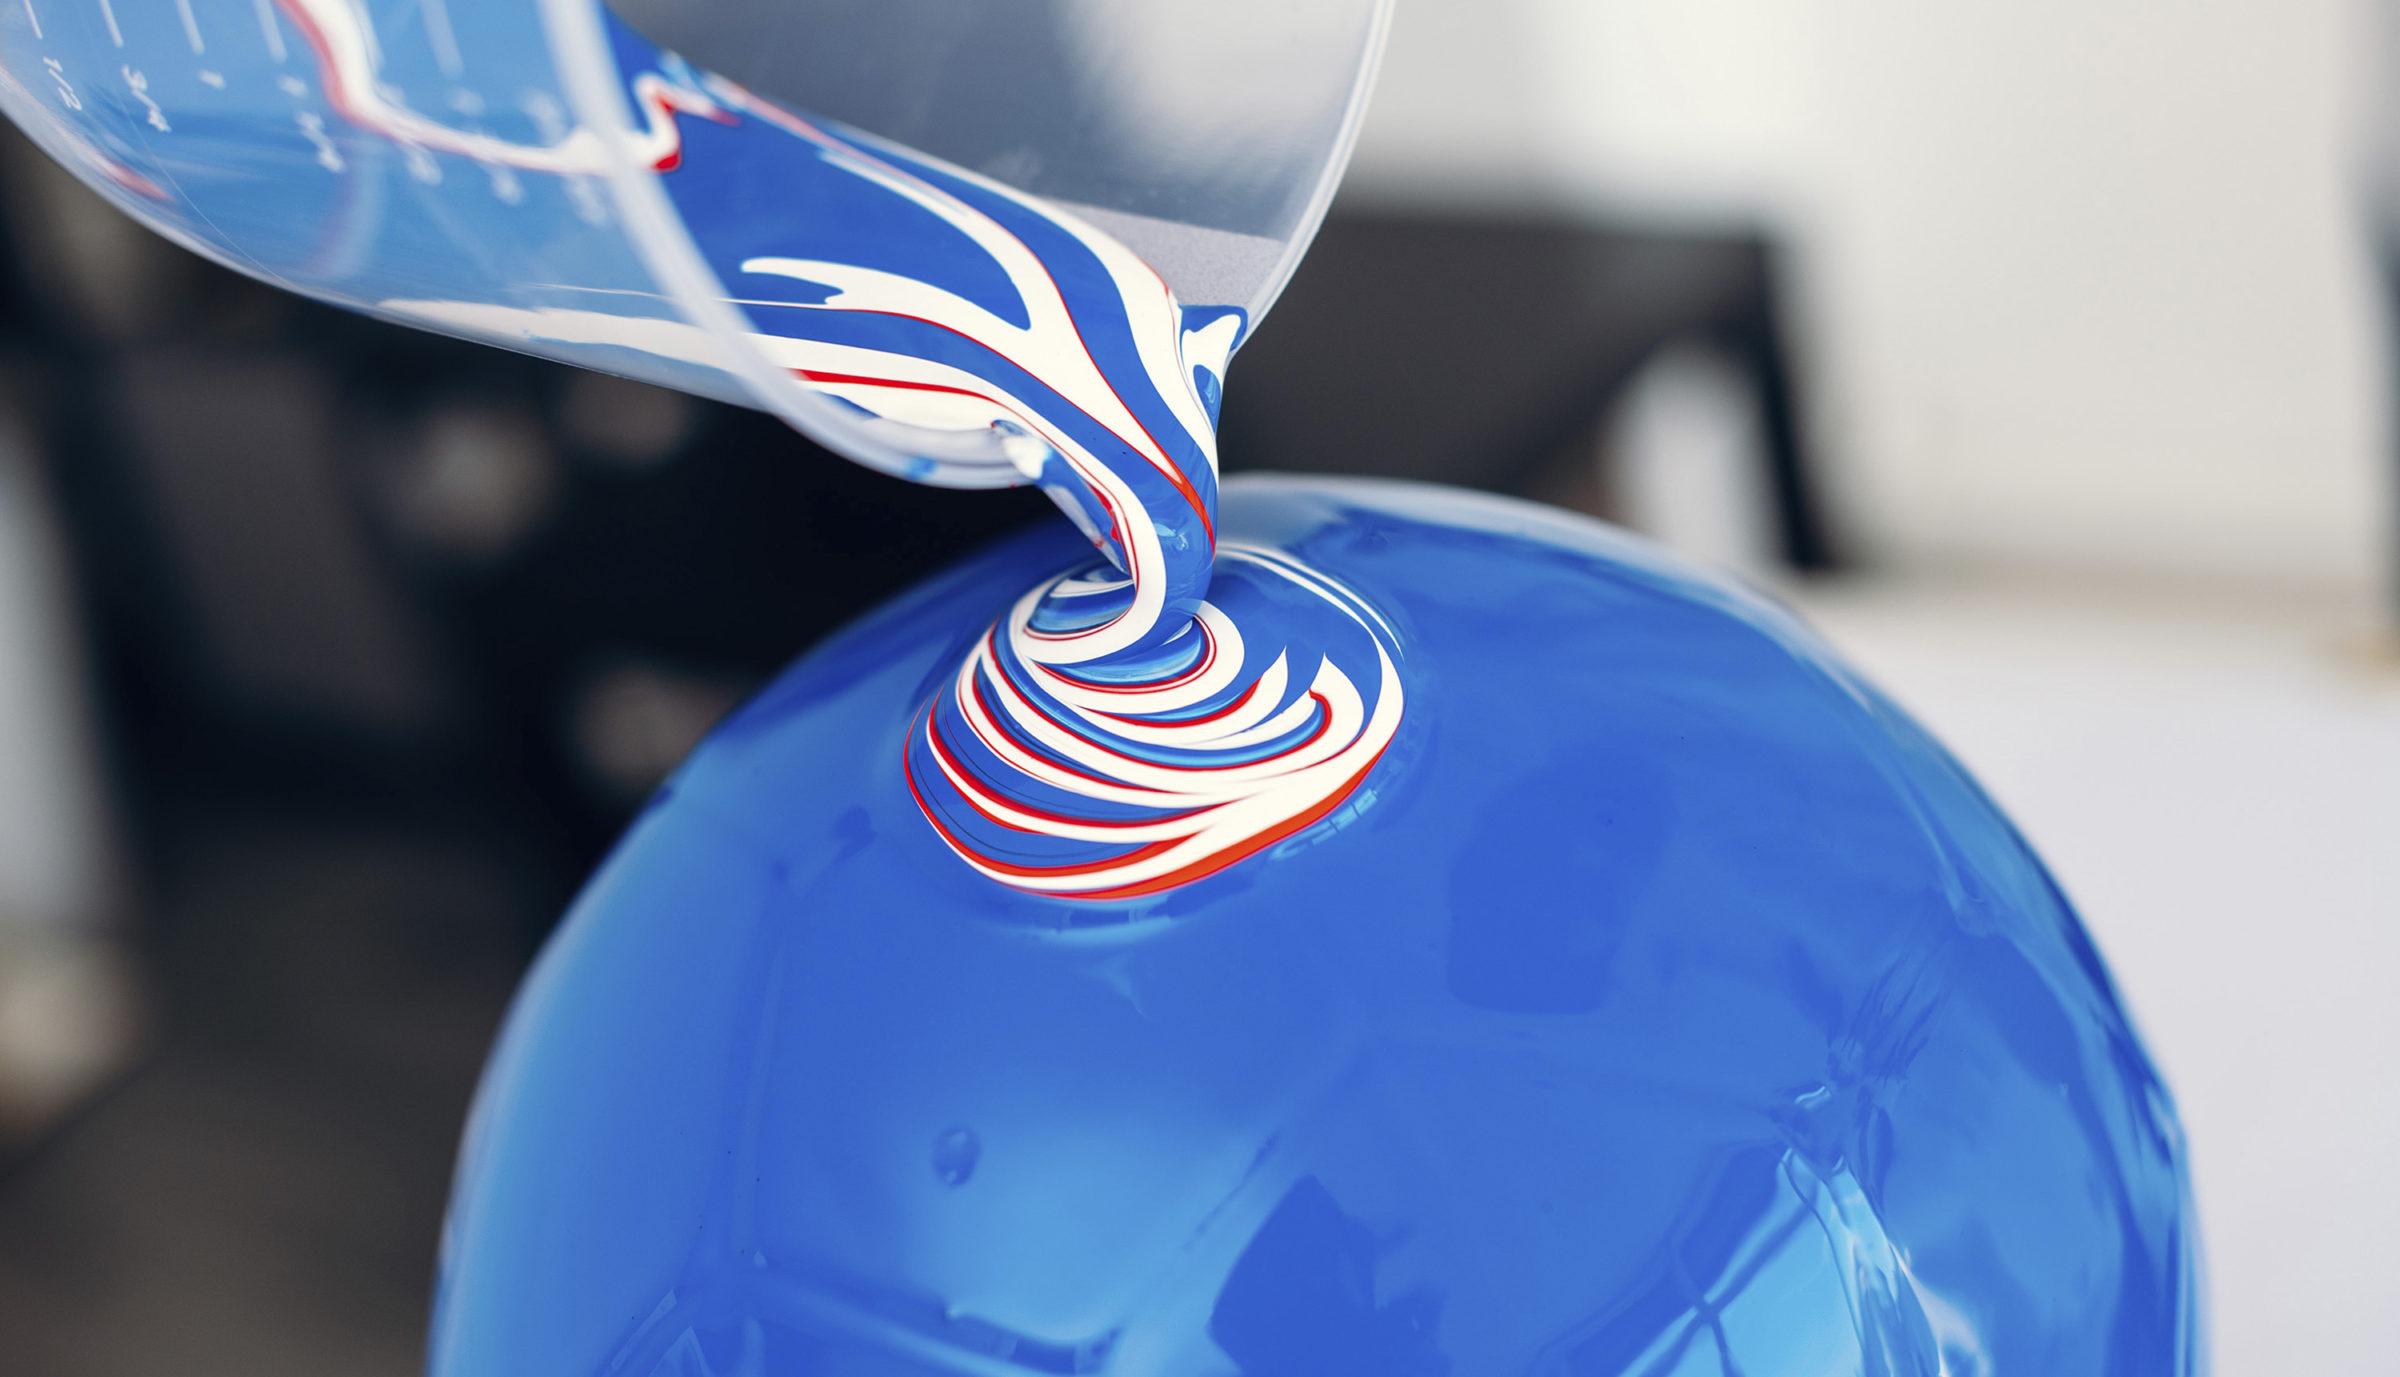 Craig Black x The Fusion Series Footballs Acrylic Fusion Football Art Installation 13 France